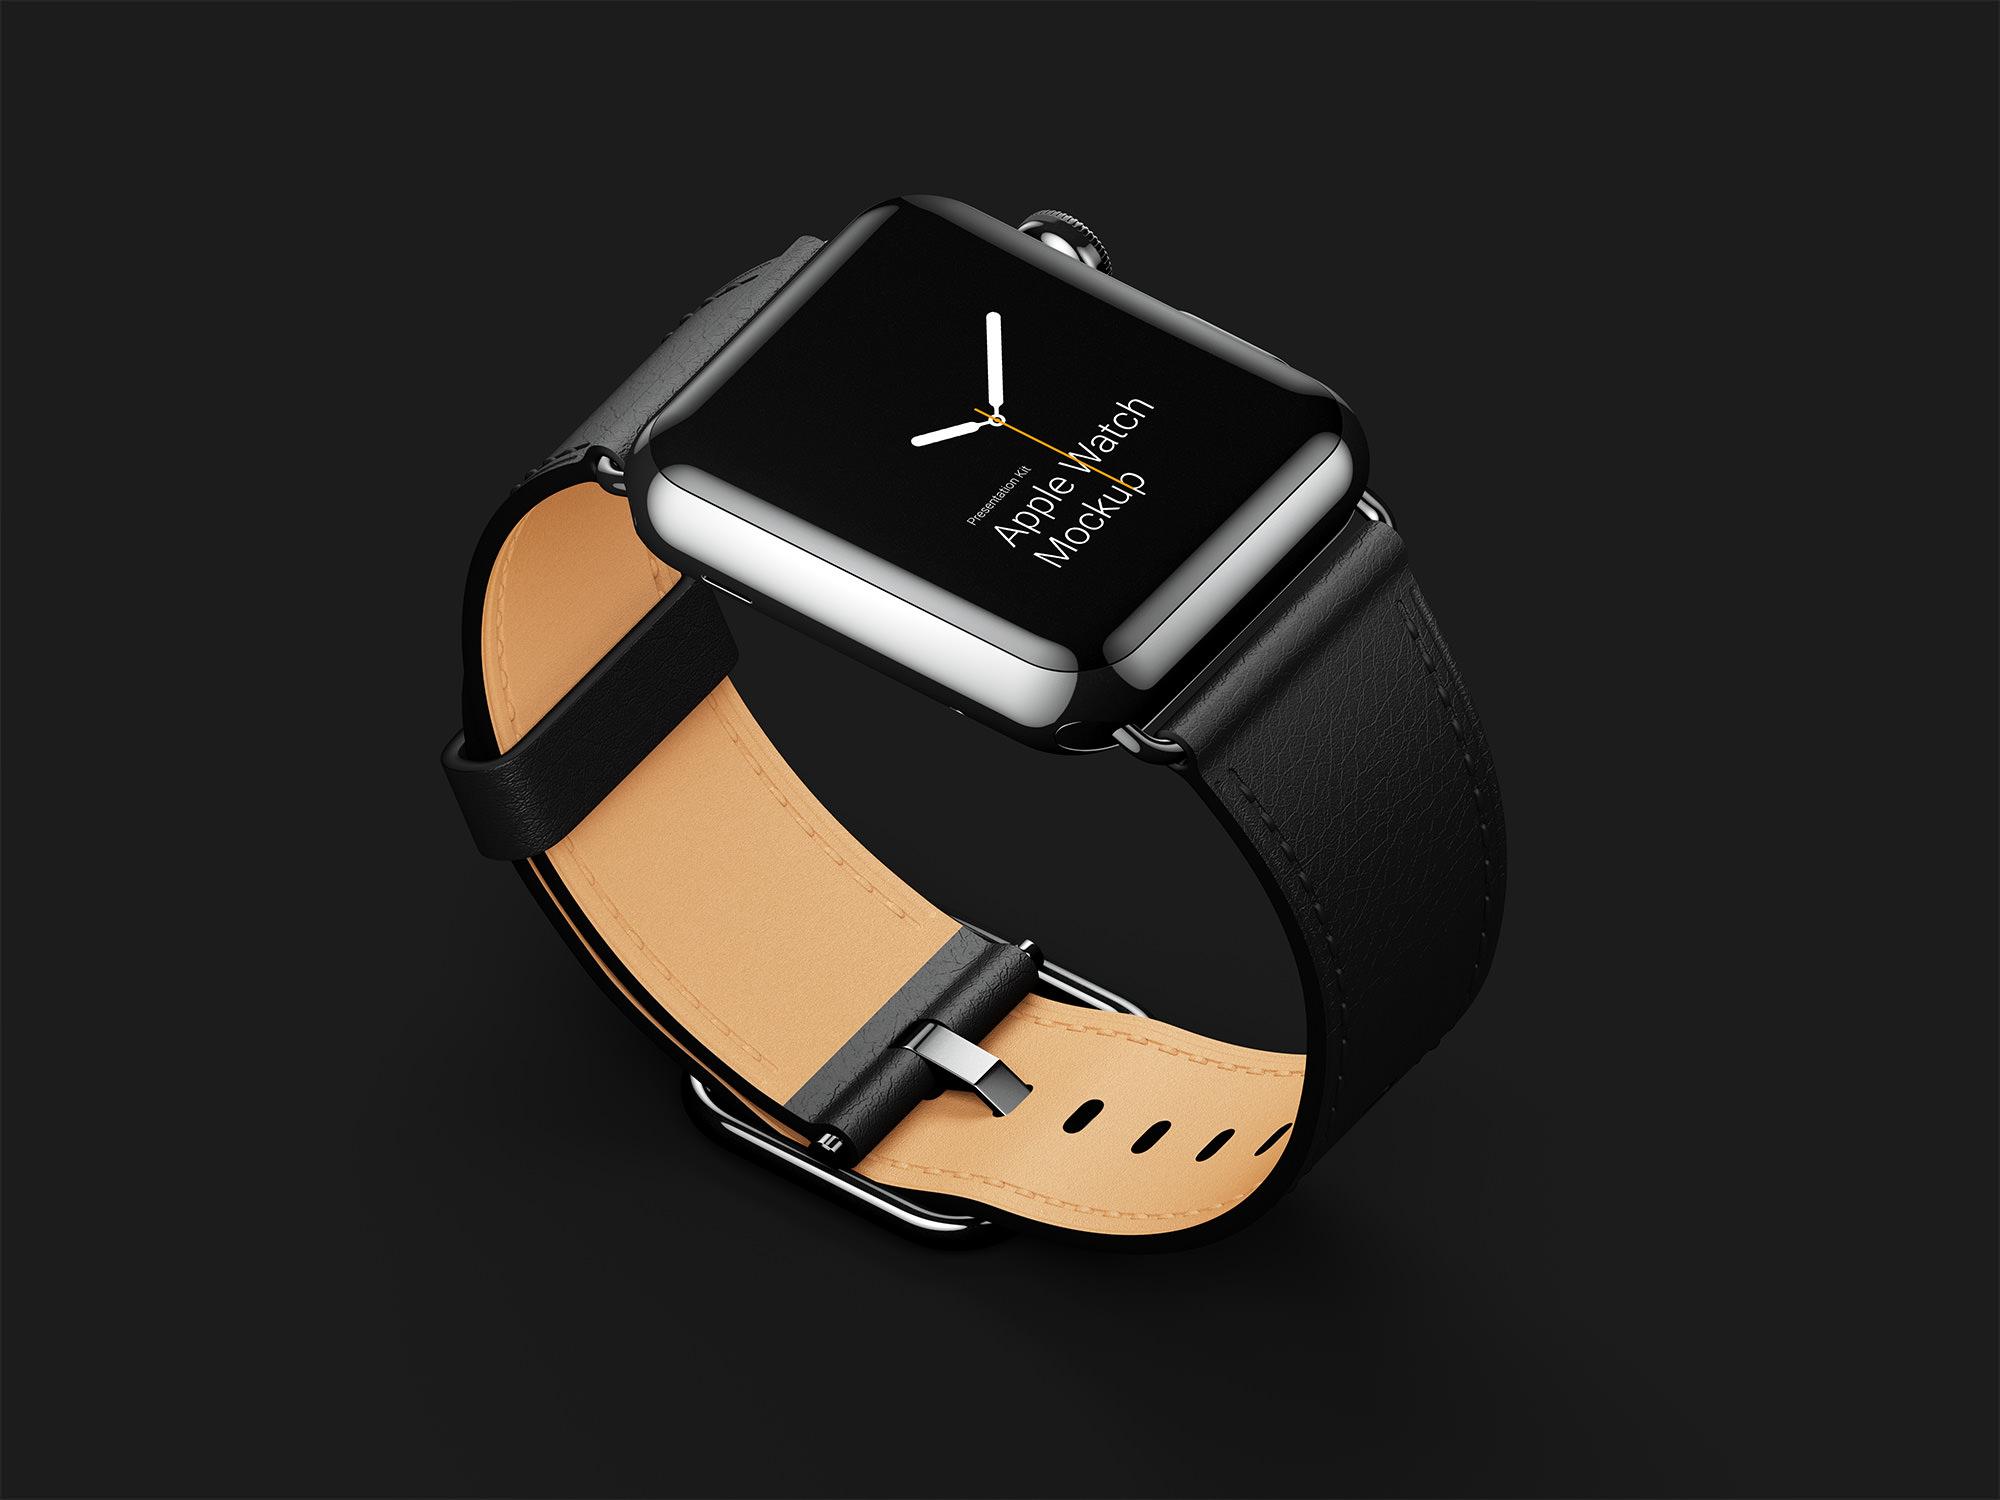 Leather Band Apple Watch Mockup